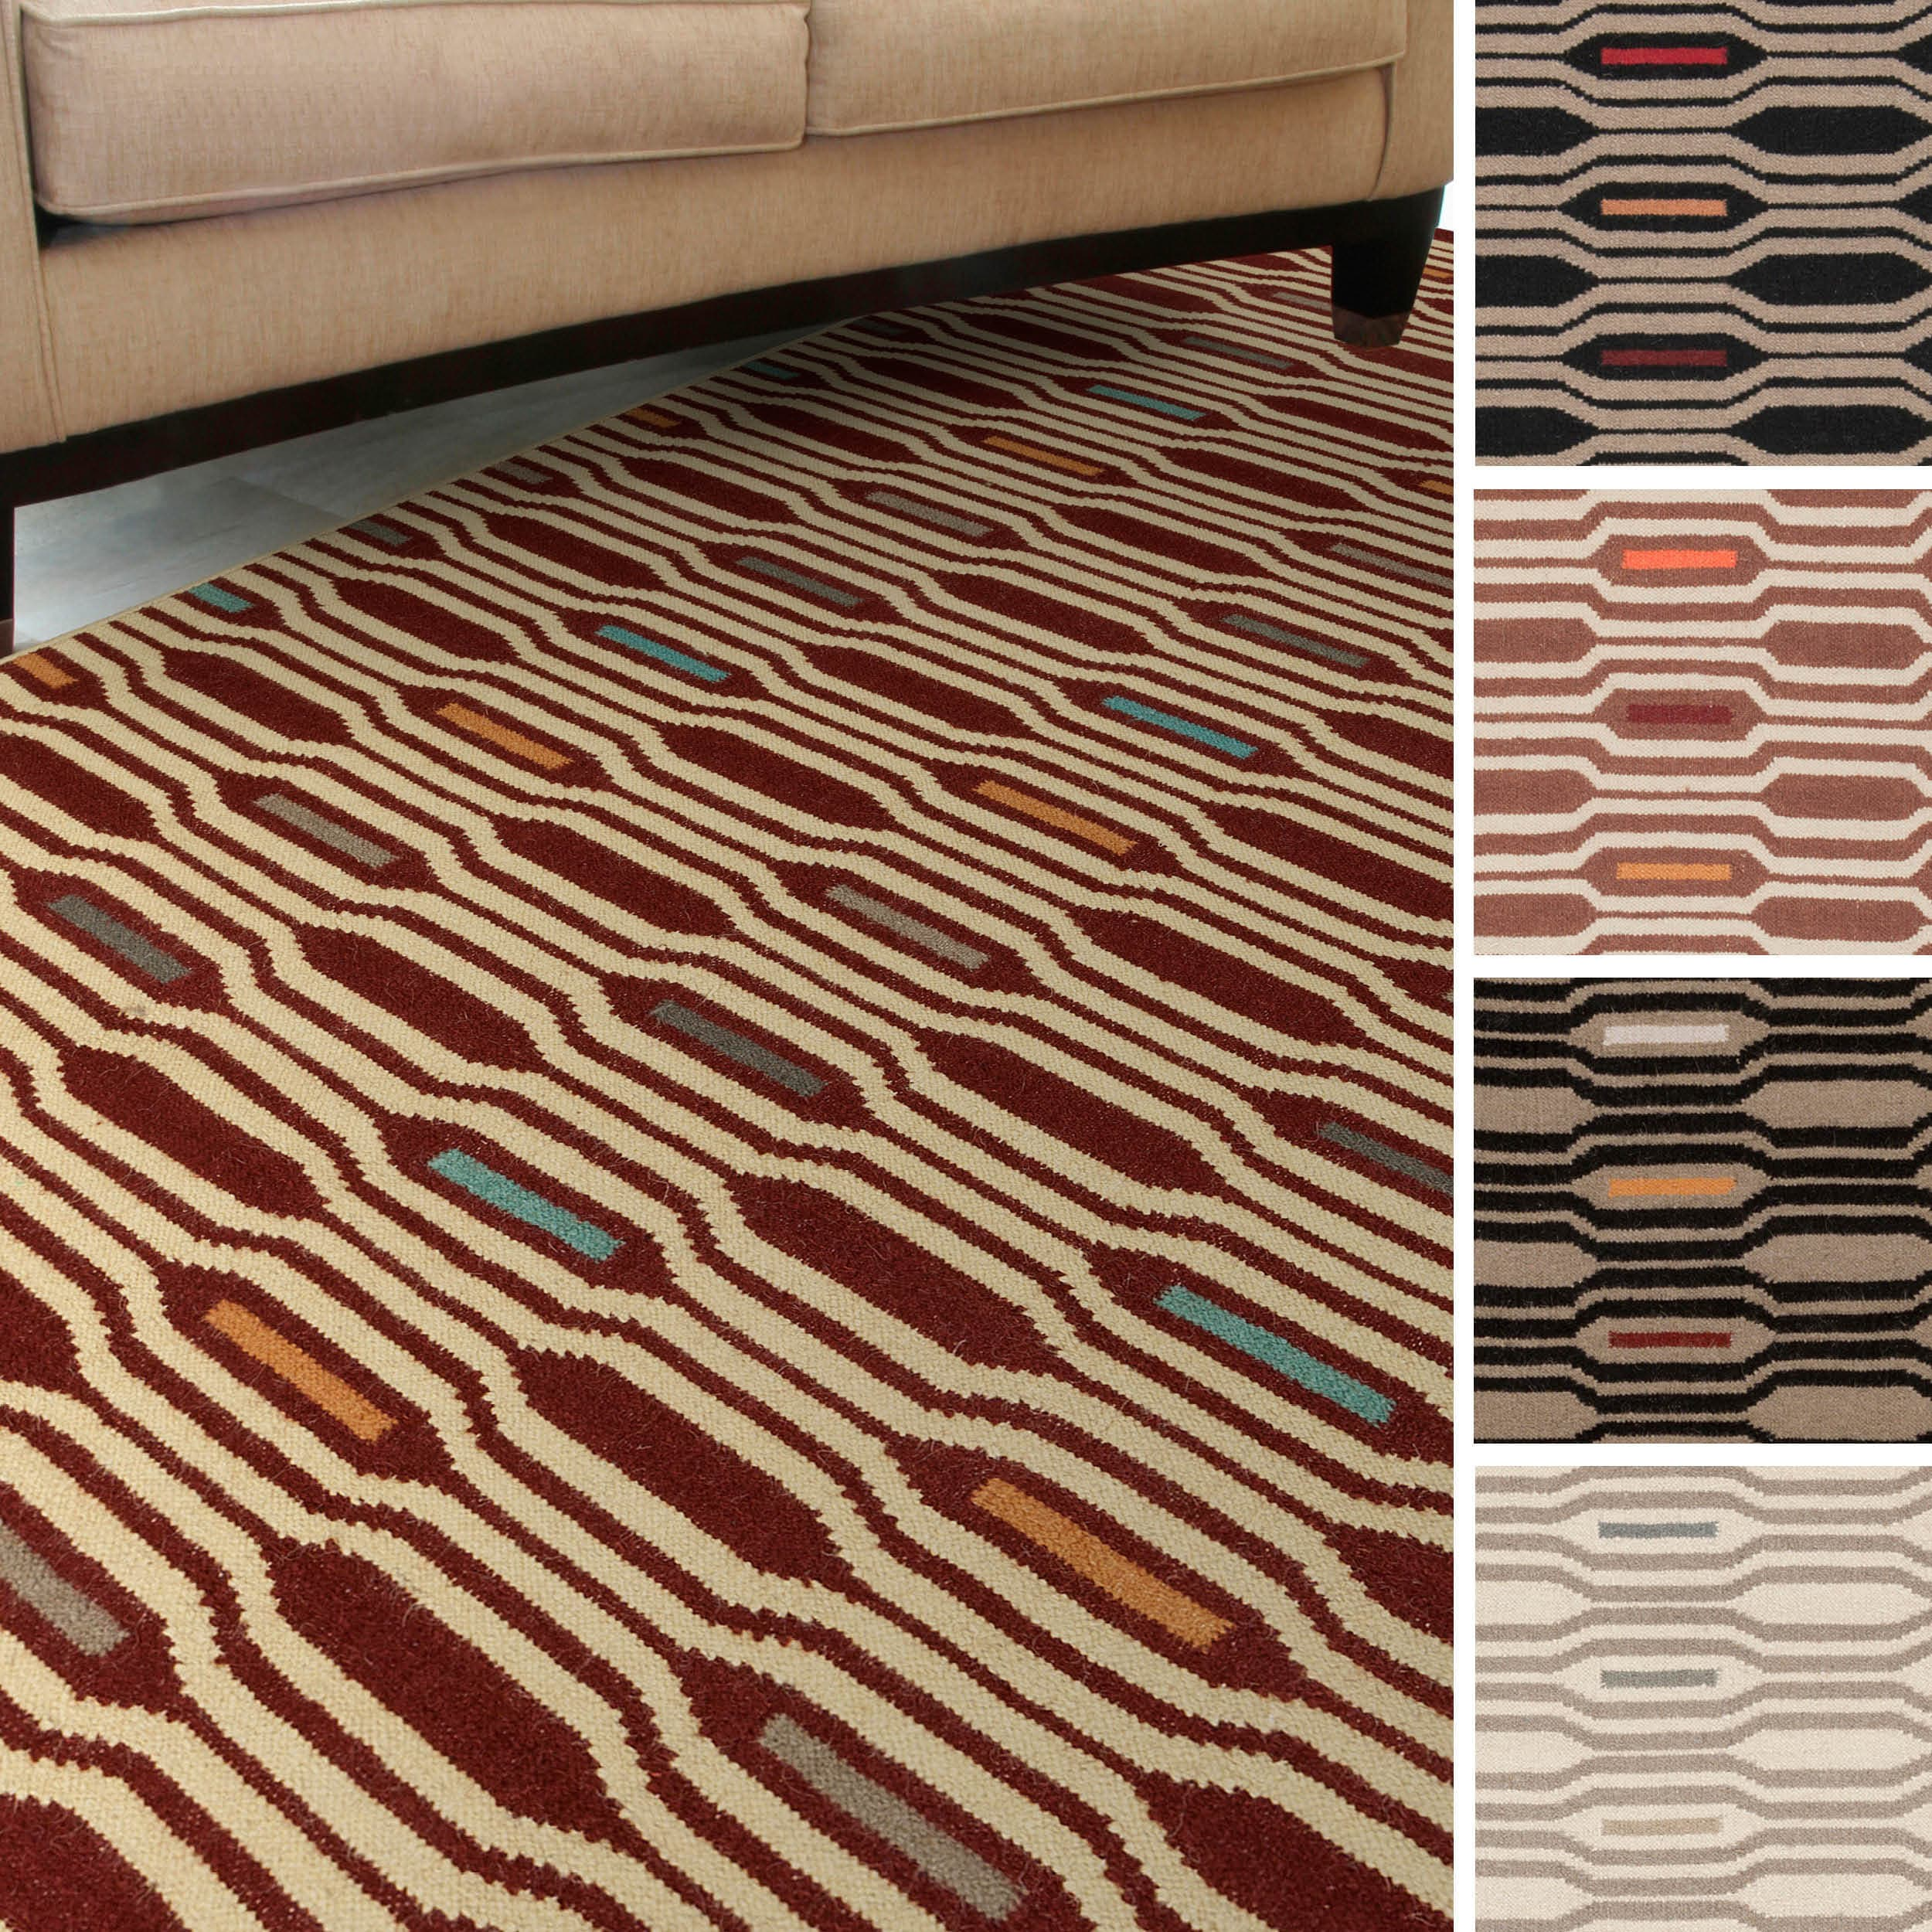 Overstock.com Leon Flatweave Geometric Area Rug (3'6 x 5'6) at Sears.com